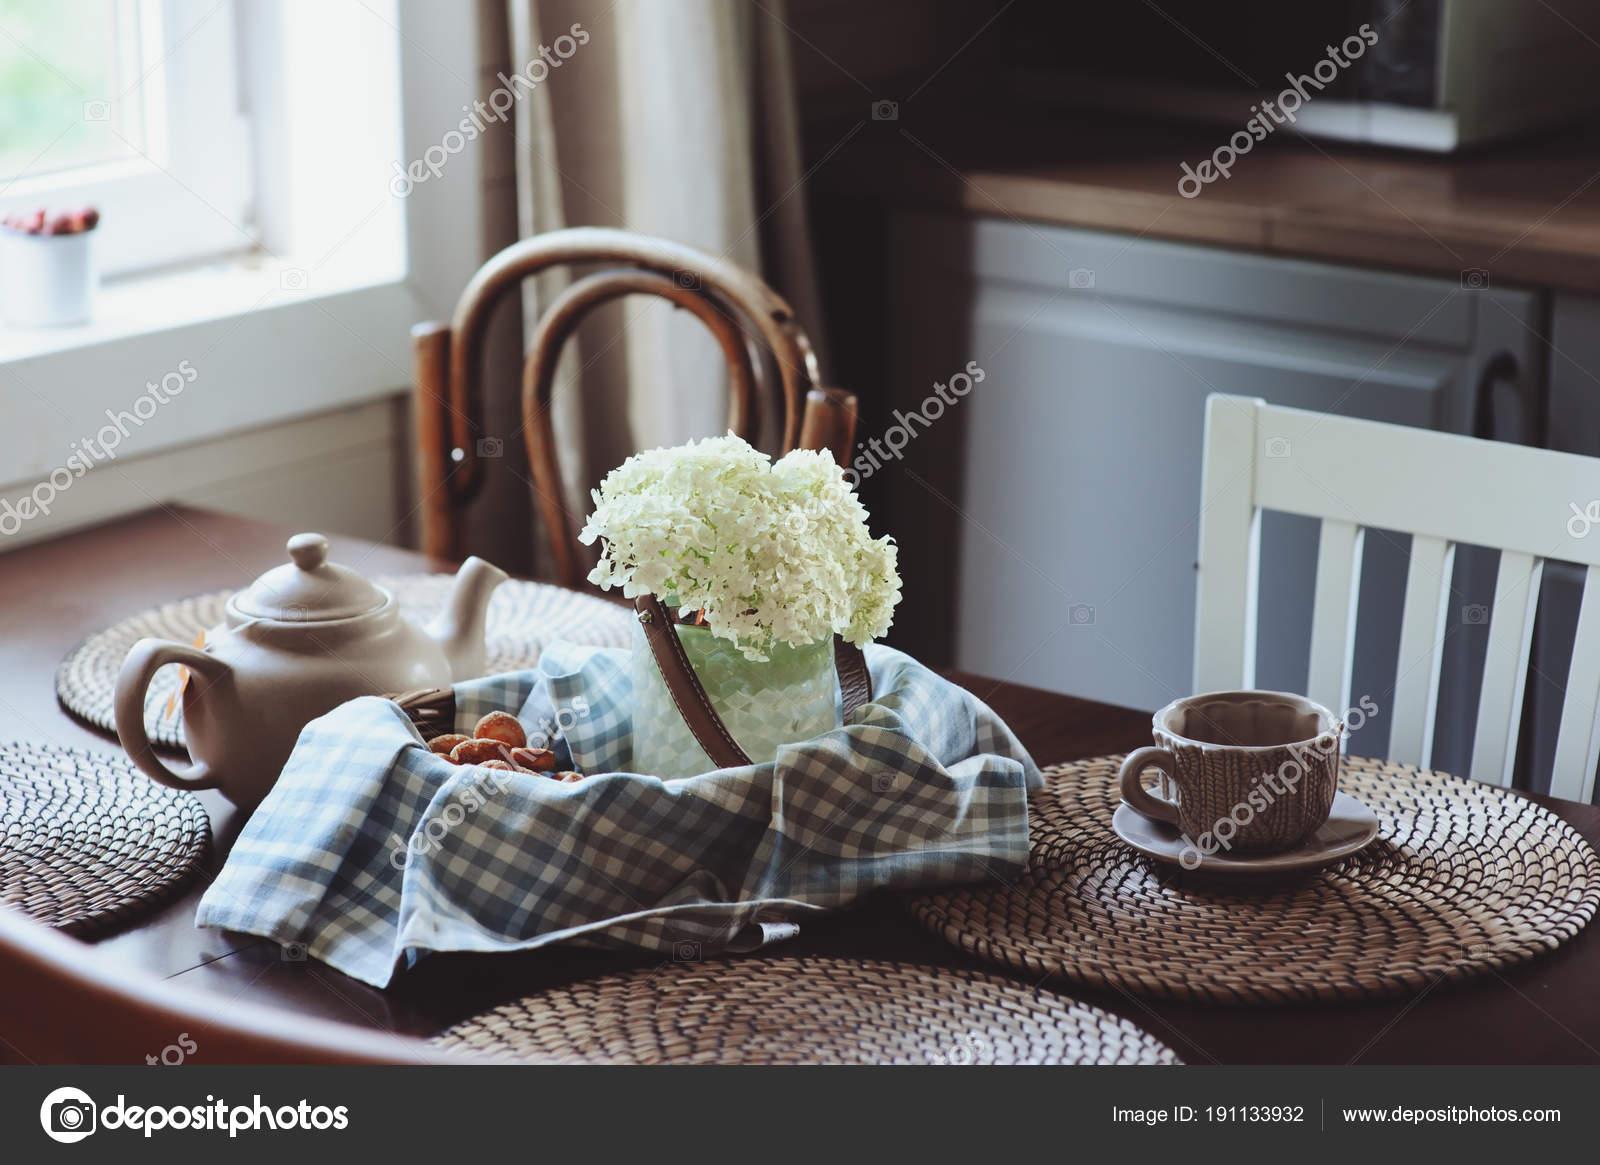 Cuisine Maison Campagne confortable matin Été cuisine maison campagne rustique thé